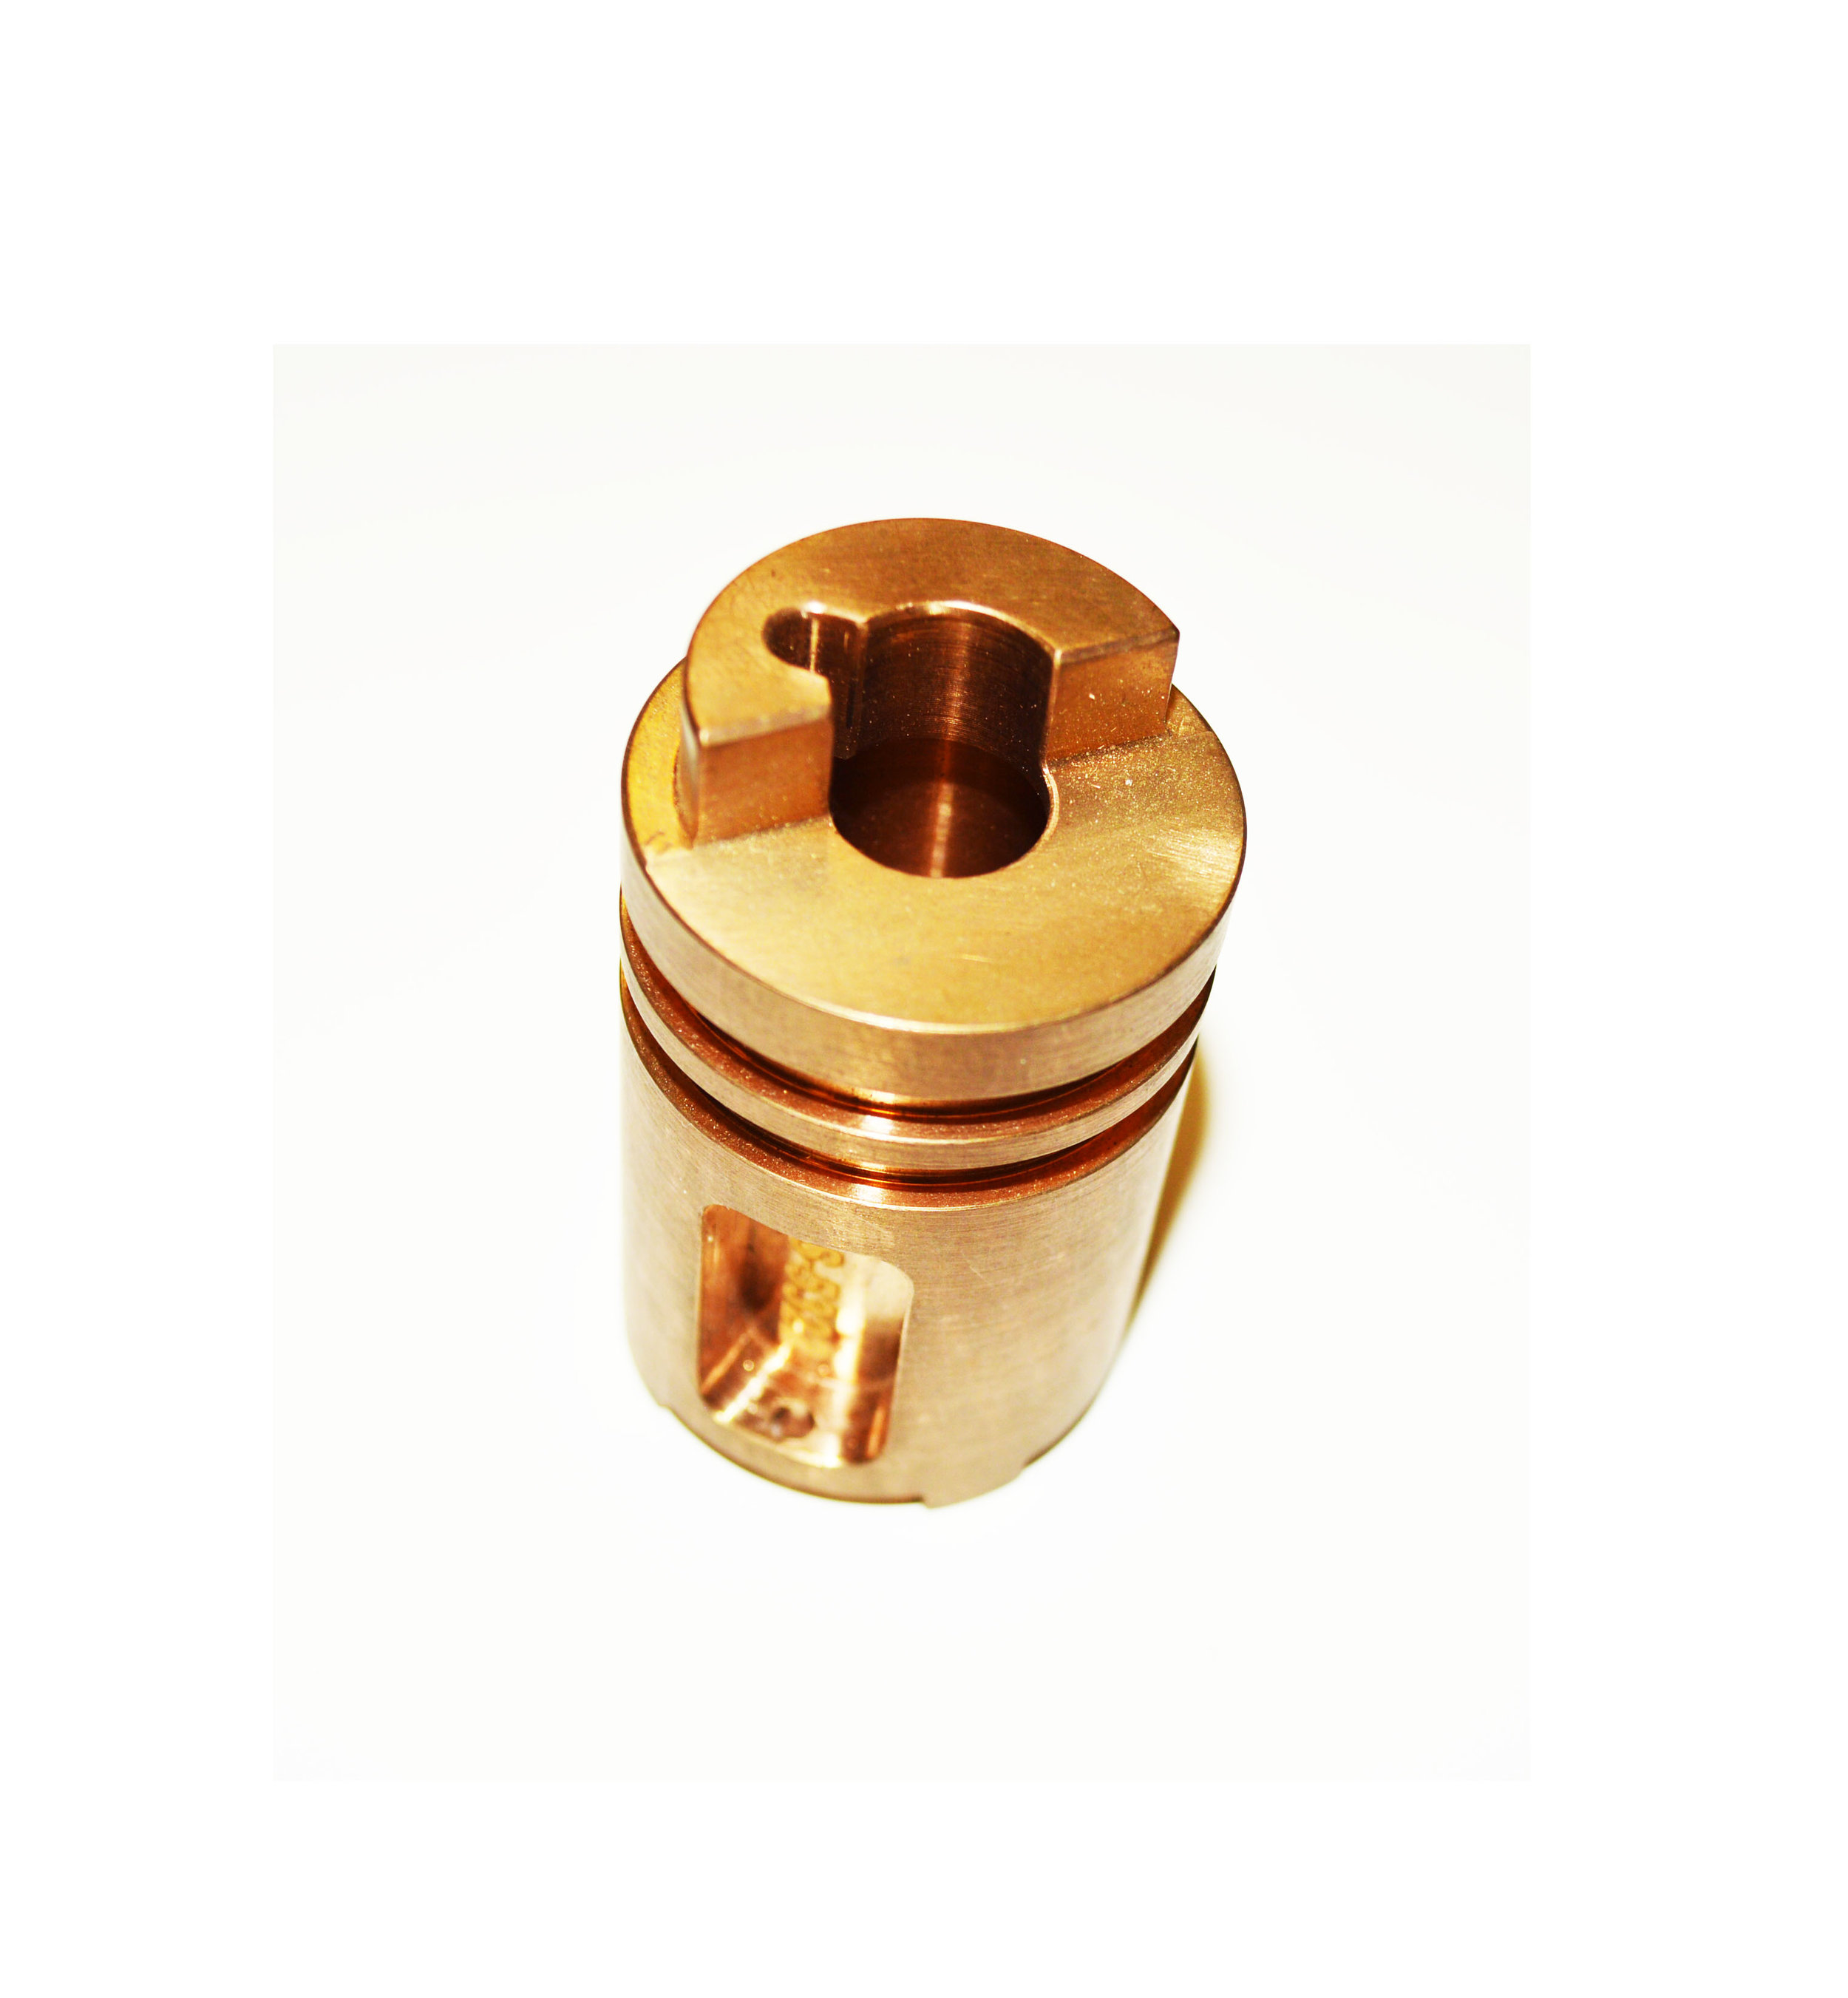 45 Degree Bottom         Bulkhead Retainer             BeCu      217 O-Ring:SMS-5300      124 O-Ring:SMS-5322